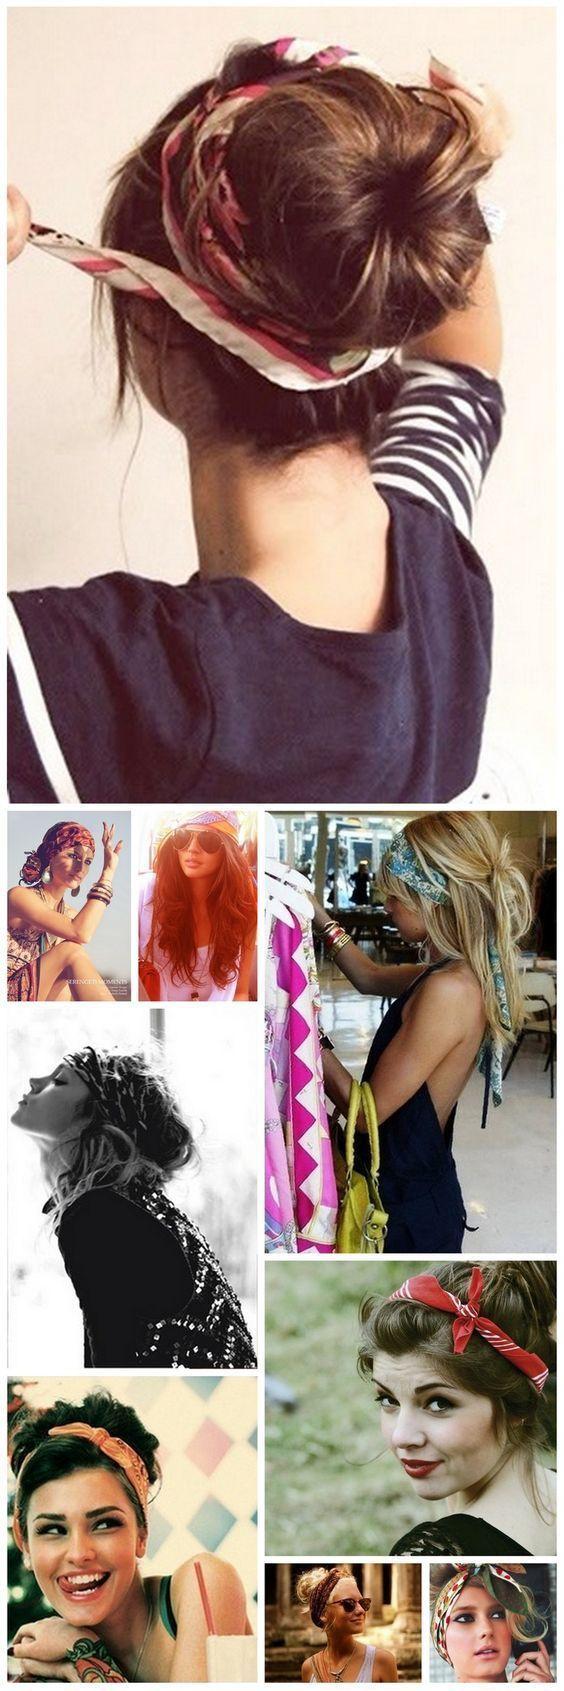 Augen Make-up Hairdressing Hair Scarf # eyemakeup # Mascara # Lidschatten # Schönheit